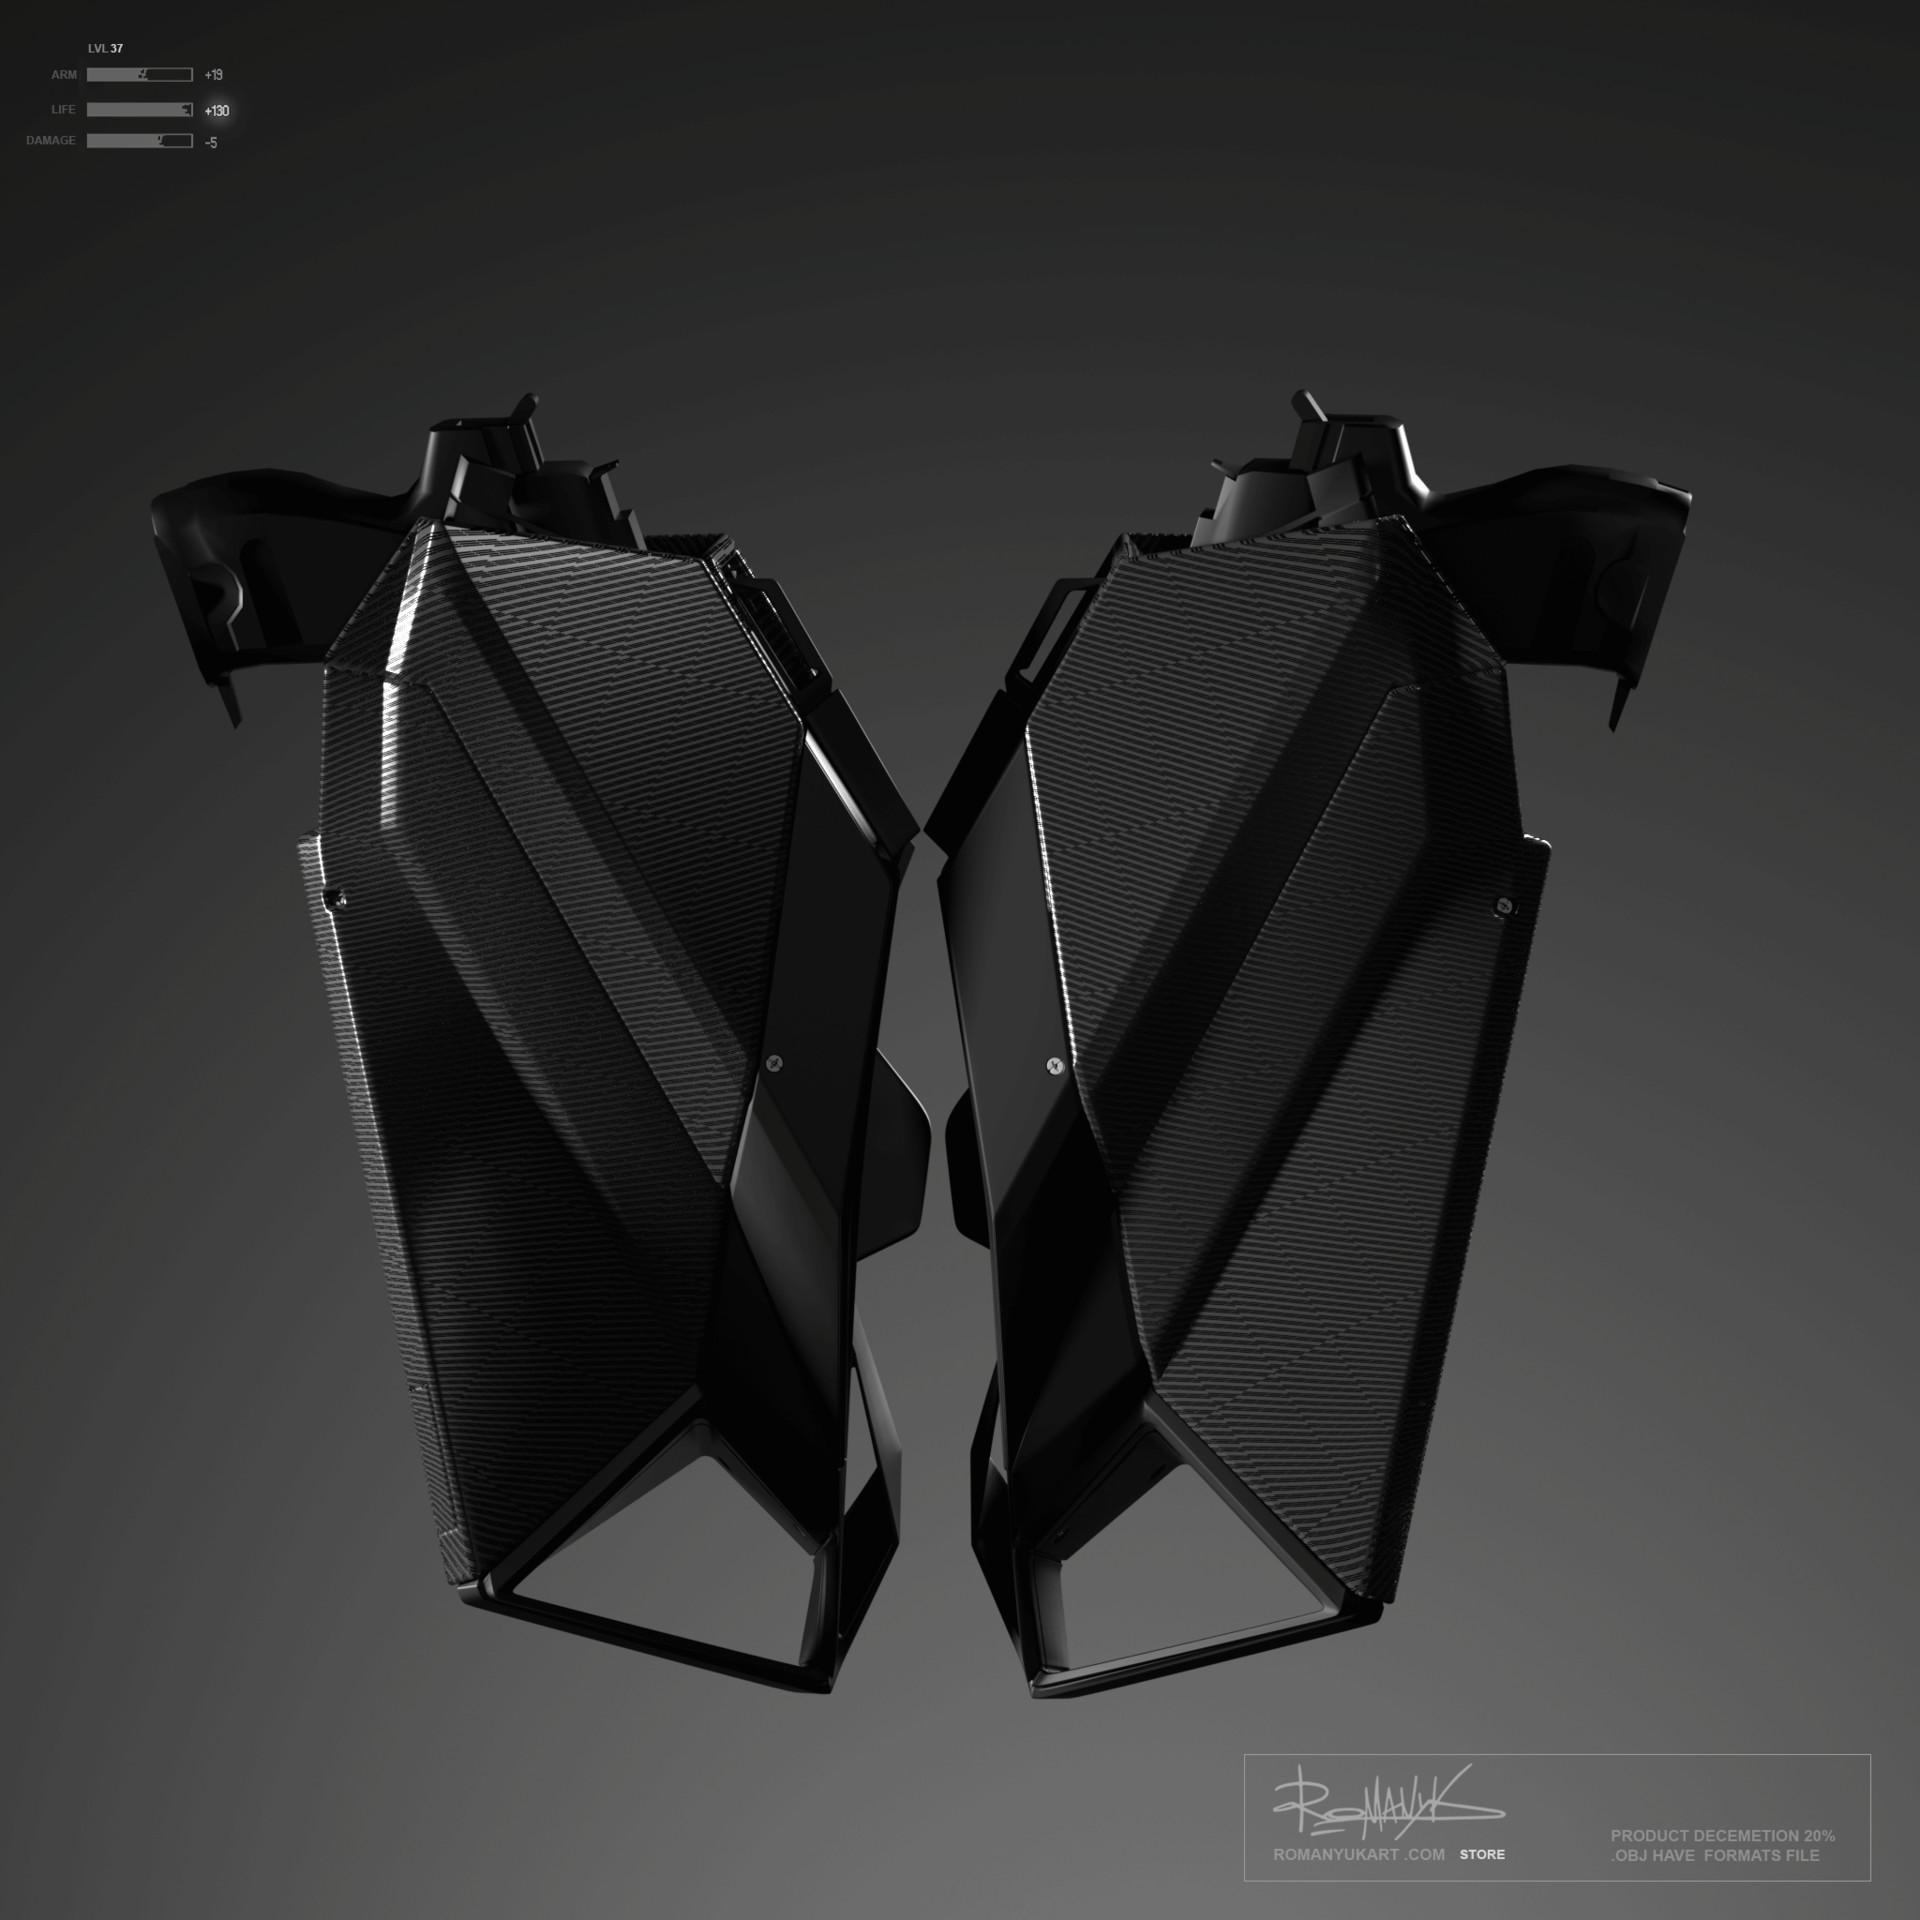 Yuriy romanyk backpack weapons01